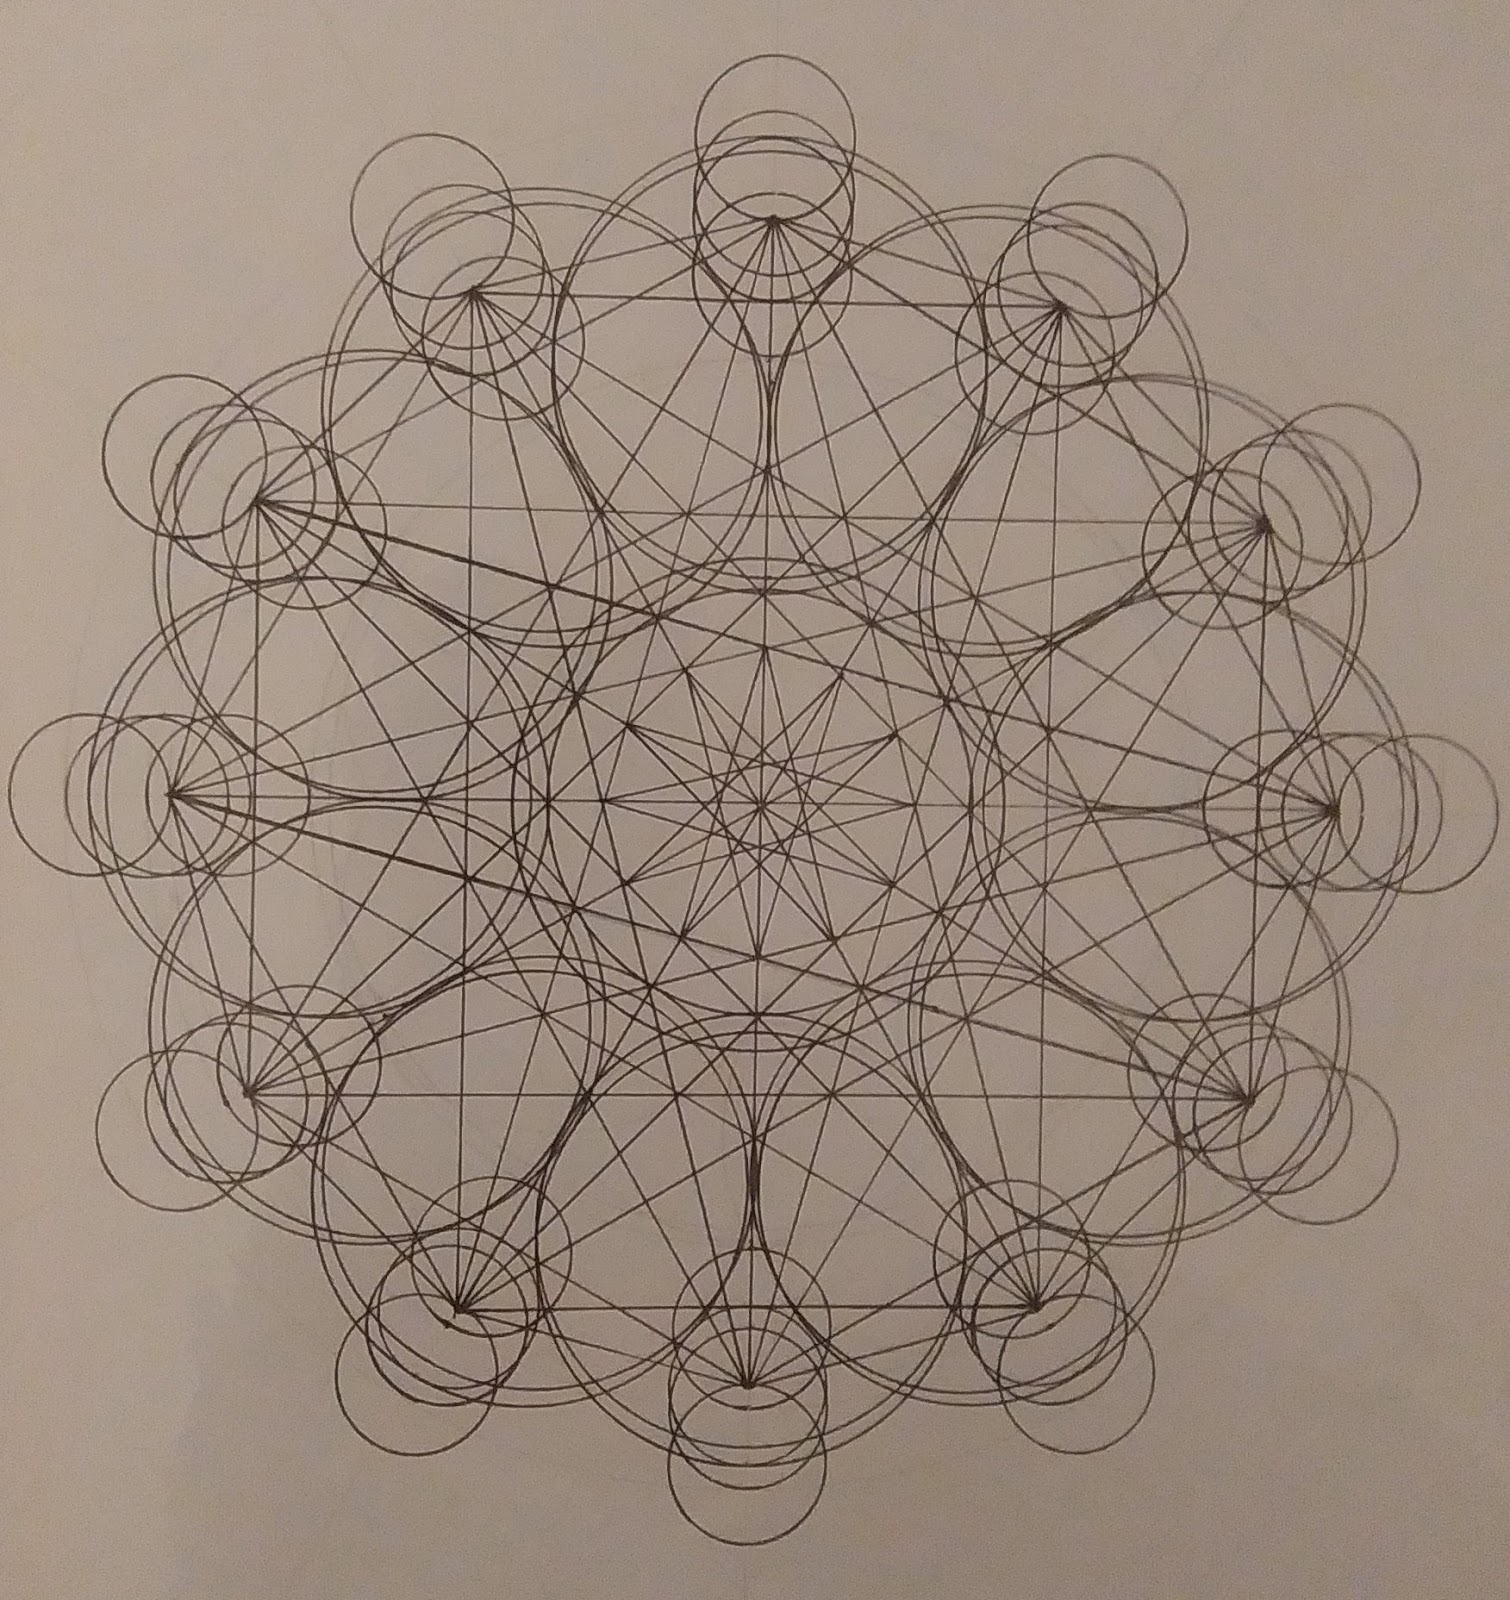 [SPOLYK] - Geometries & sketches - Page 6 47579314_1103195356533814_1759005724387573760_o